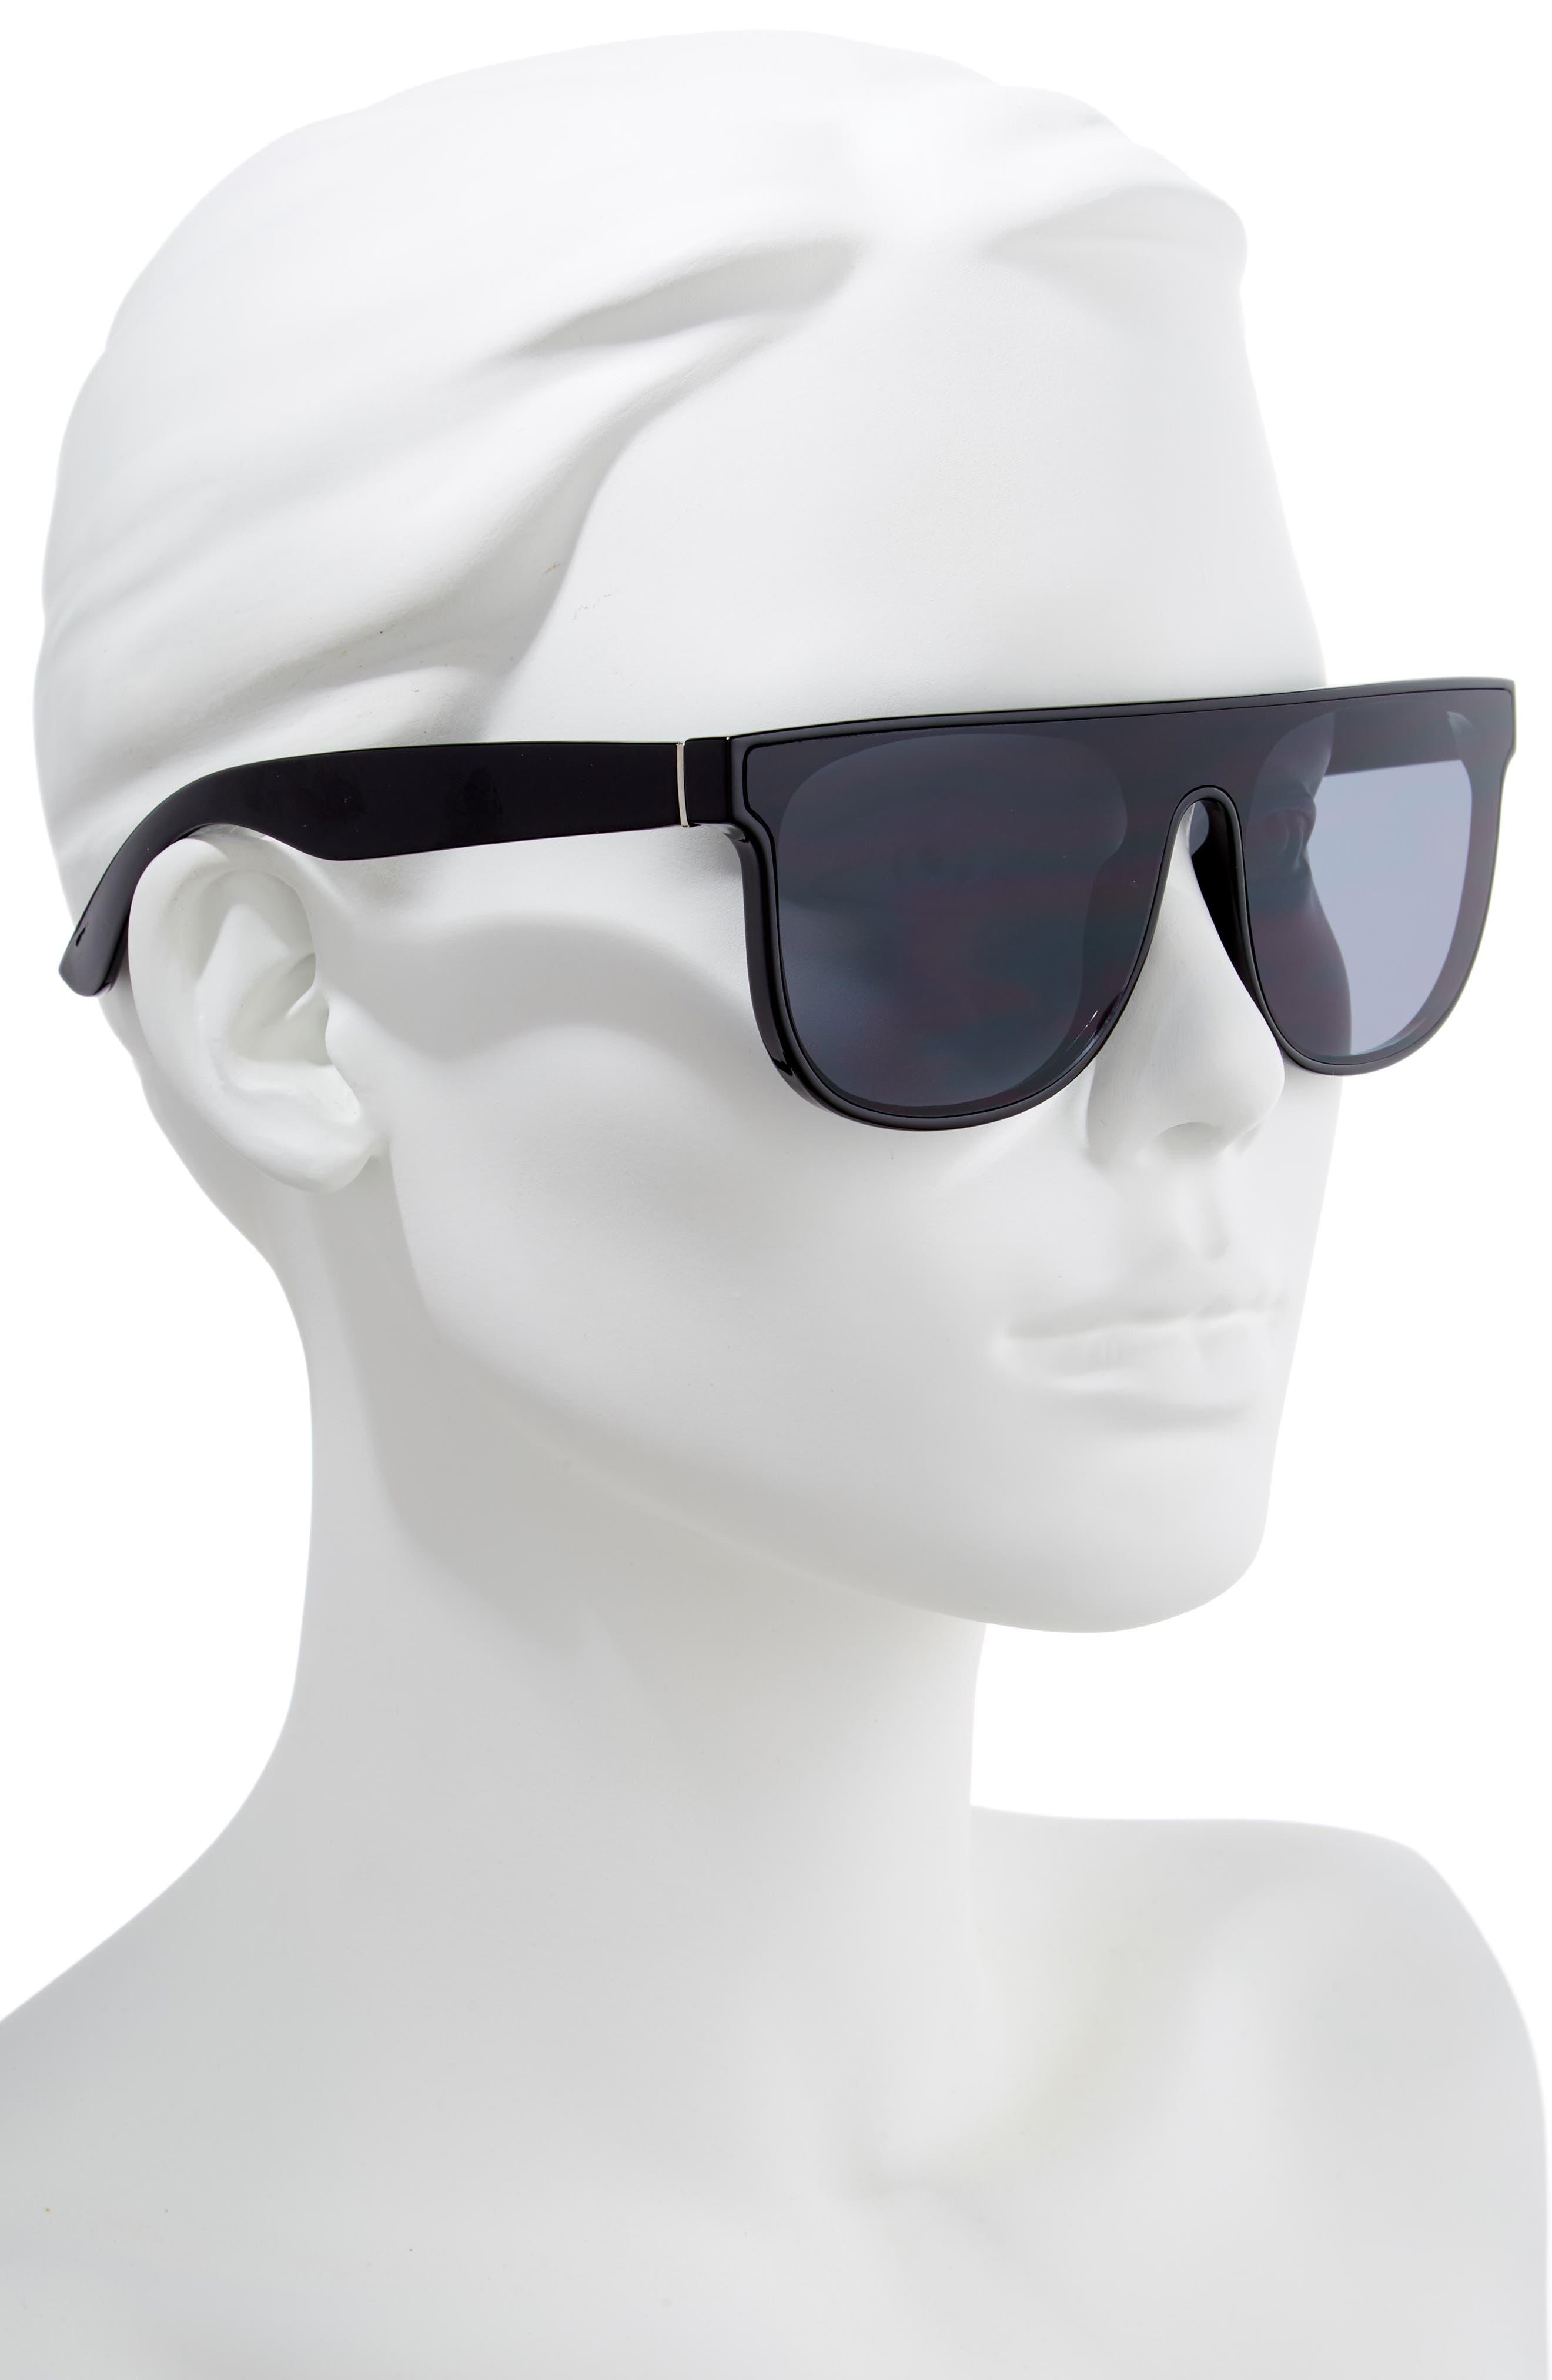 60mm Shield Sunglasses,                             Alternate thumbnail 2, color,                             001